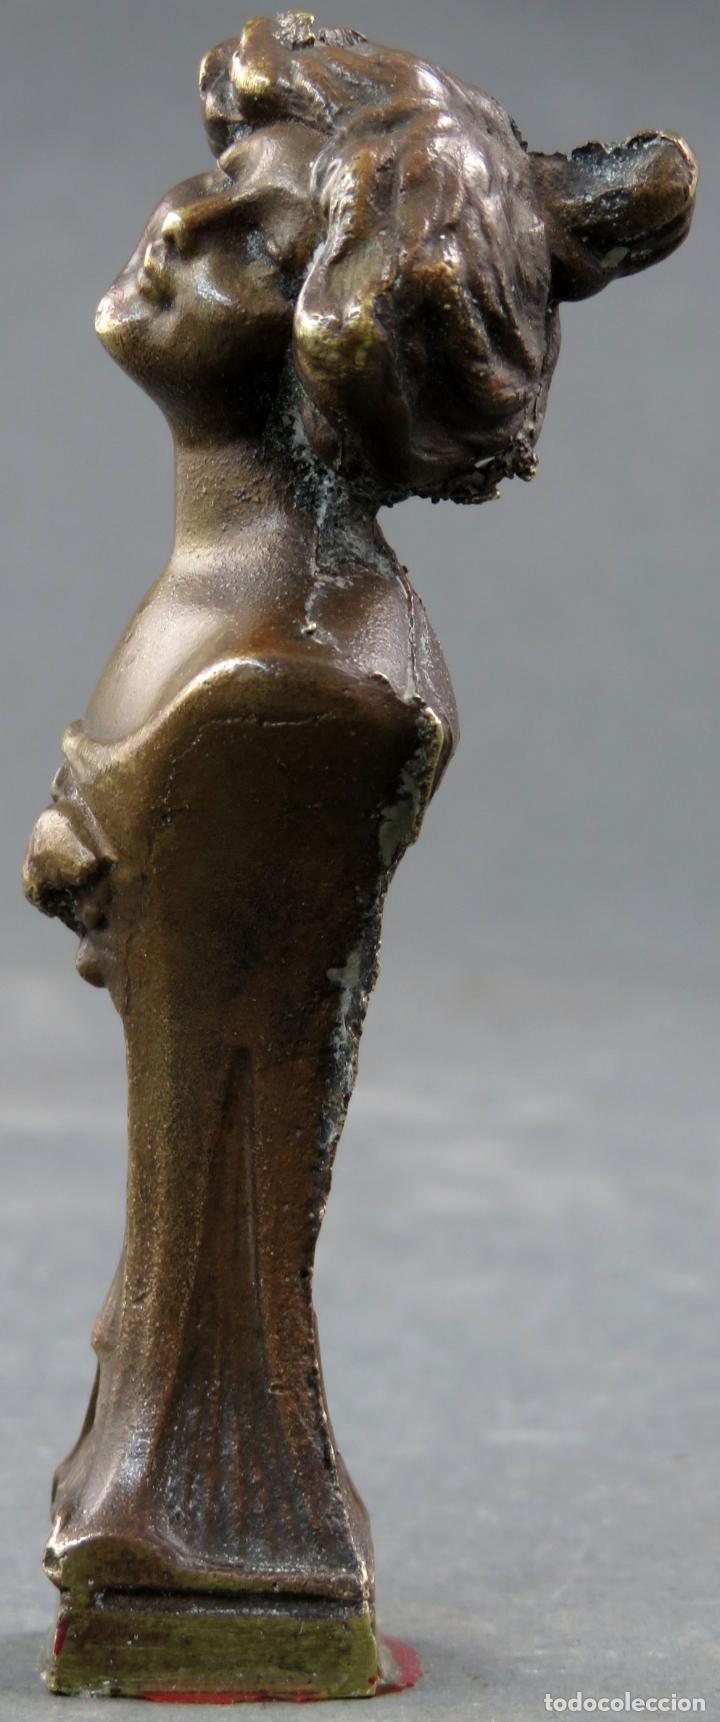 Arte: Sello en bronce Art Nouveau modernista busto femenino hacia 1910 - Foto 2 - 154967190